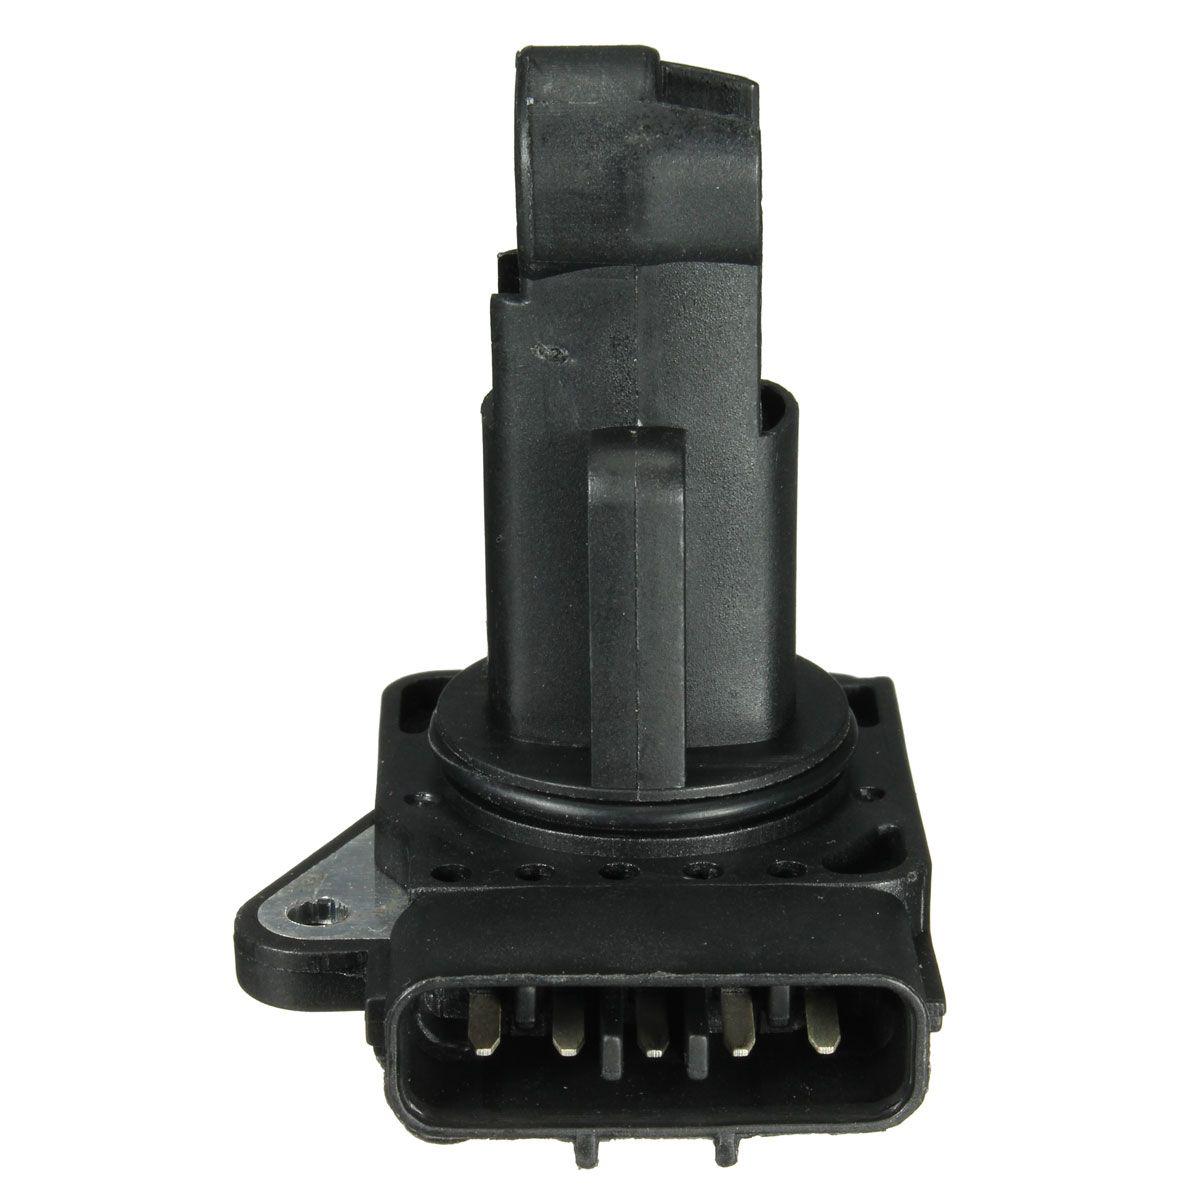 Black Mass Air Flow Meter For Mazda 2 3 5 6 CX7 MX5 & PROTEGE RX8 ZL01-13-215